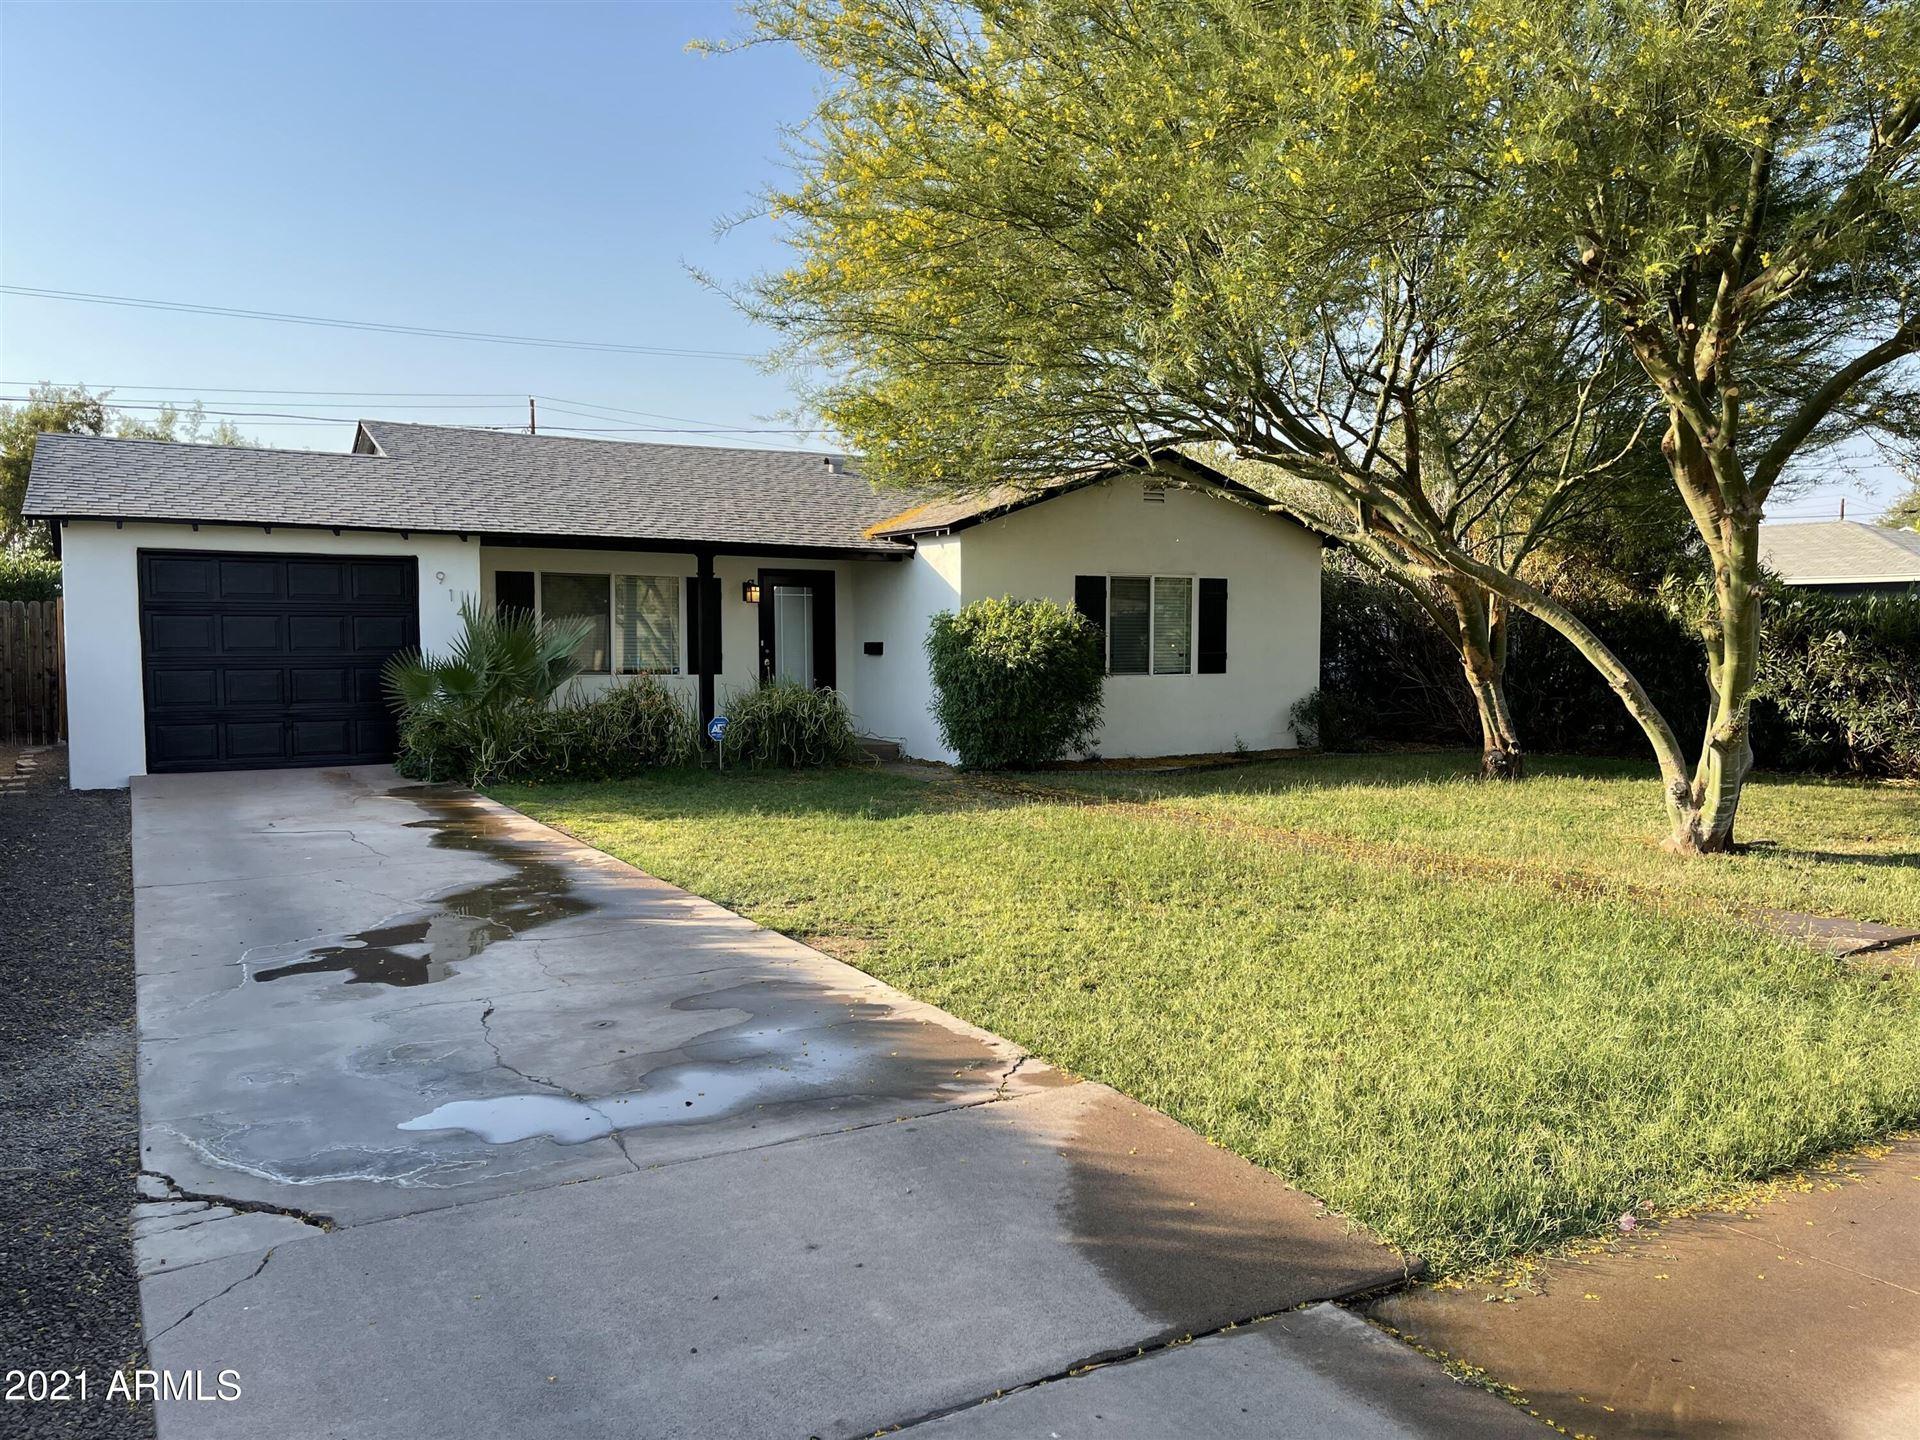 914 W ROMA Avenue, Phoenix, AZ 85013 - MLS#: 6236475